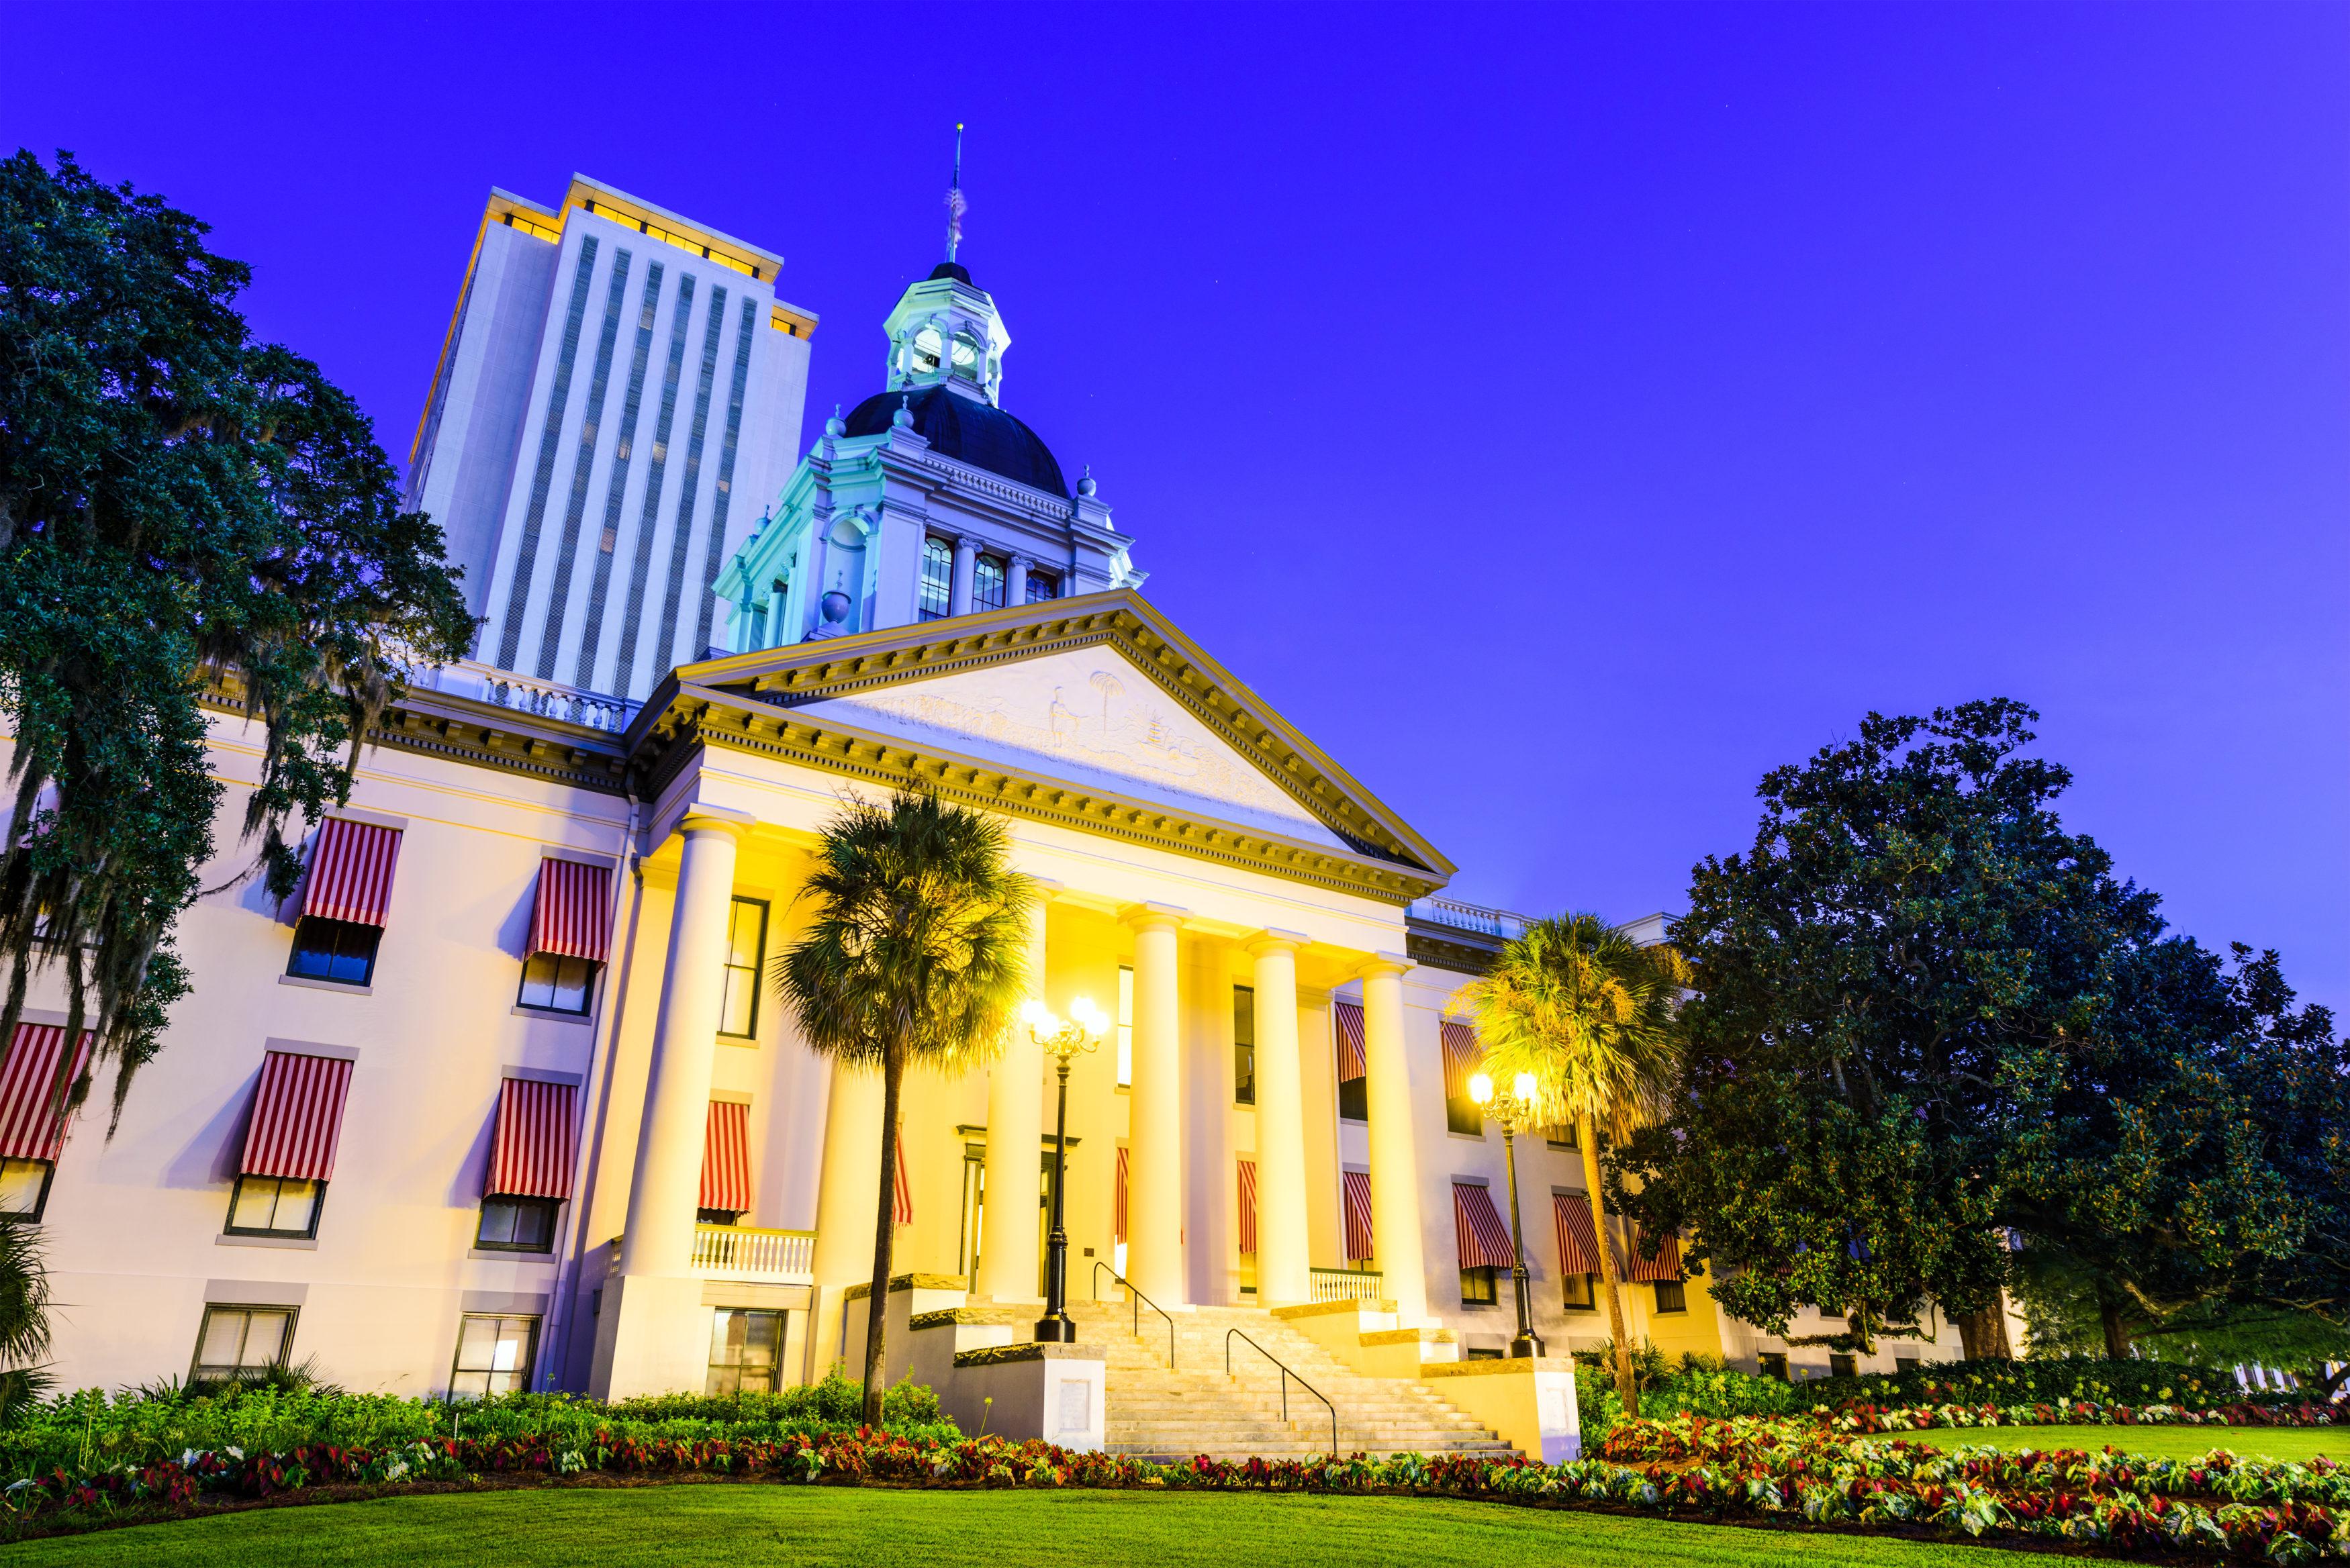 Florida-Capitol-2-3500x2336.jpg